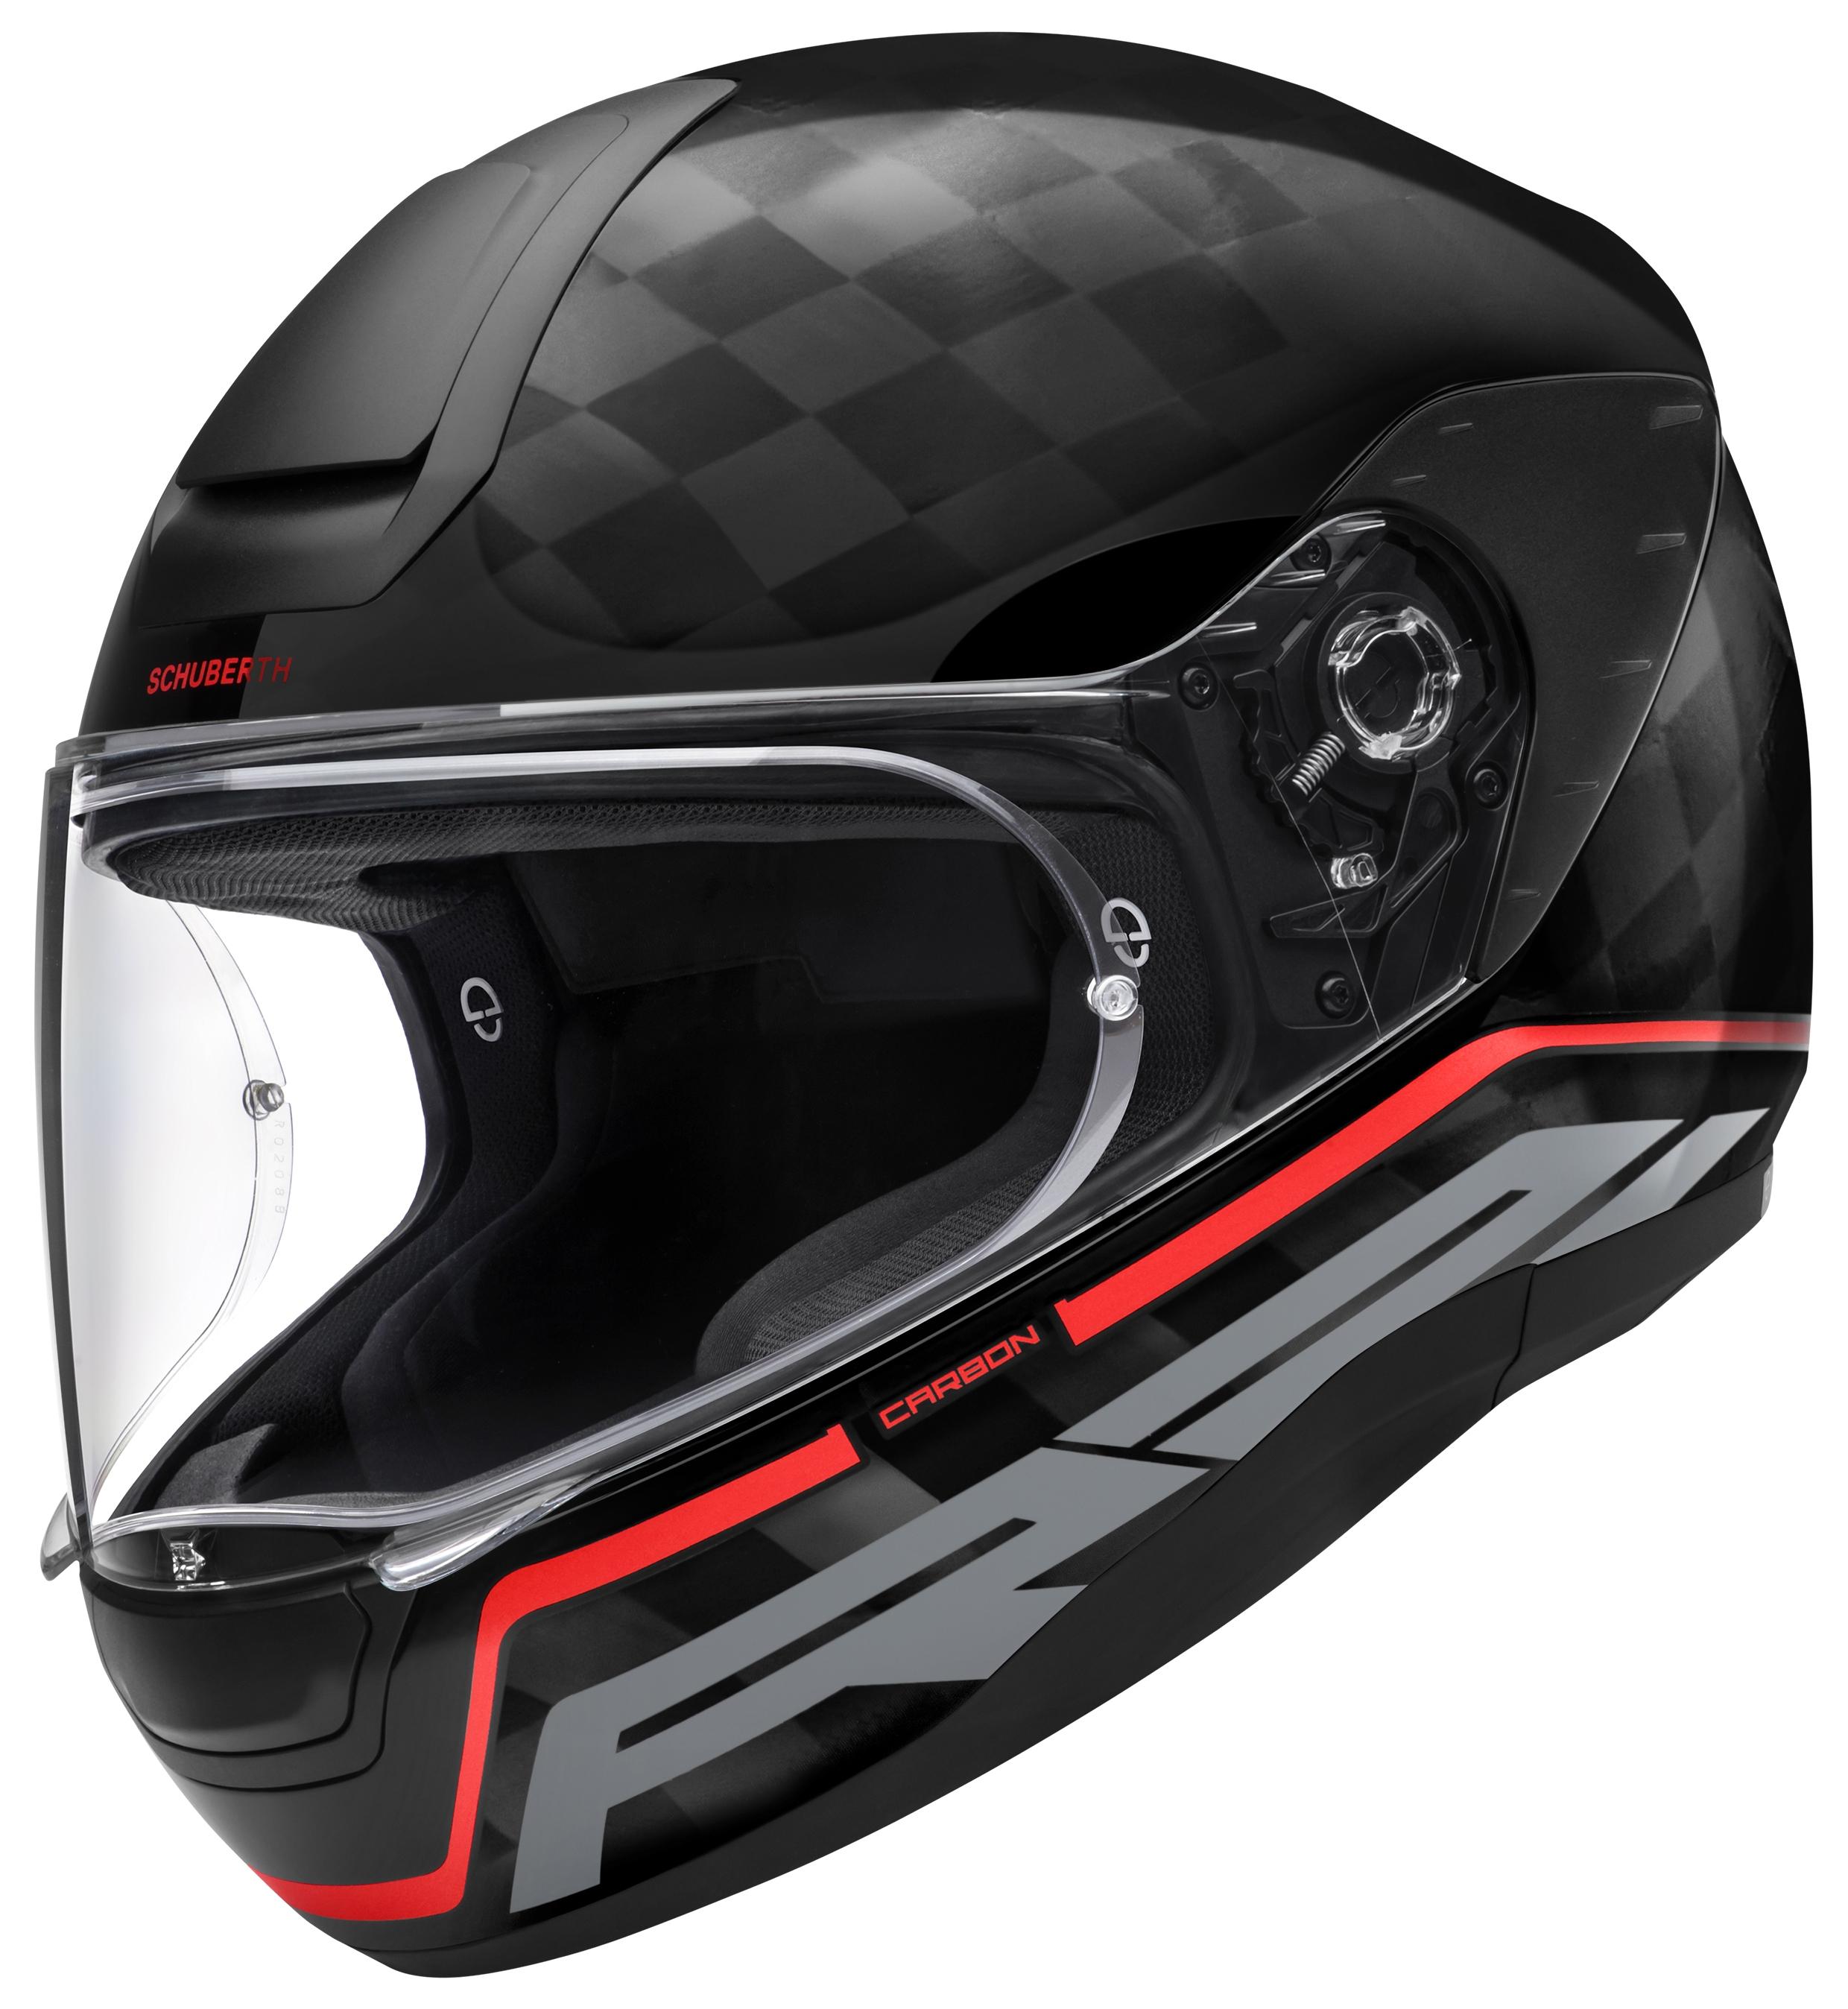 schuberth r2 carbon stroke helmet revzilla. Black Bedroom Furniture Sets. Home Design Ideas